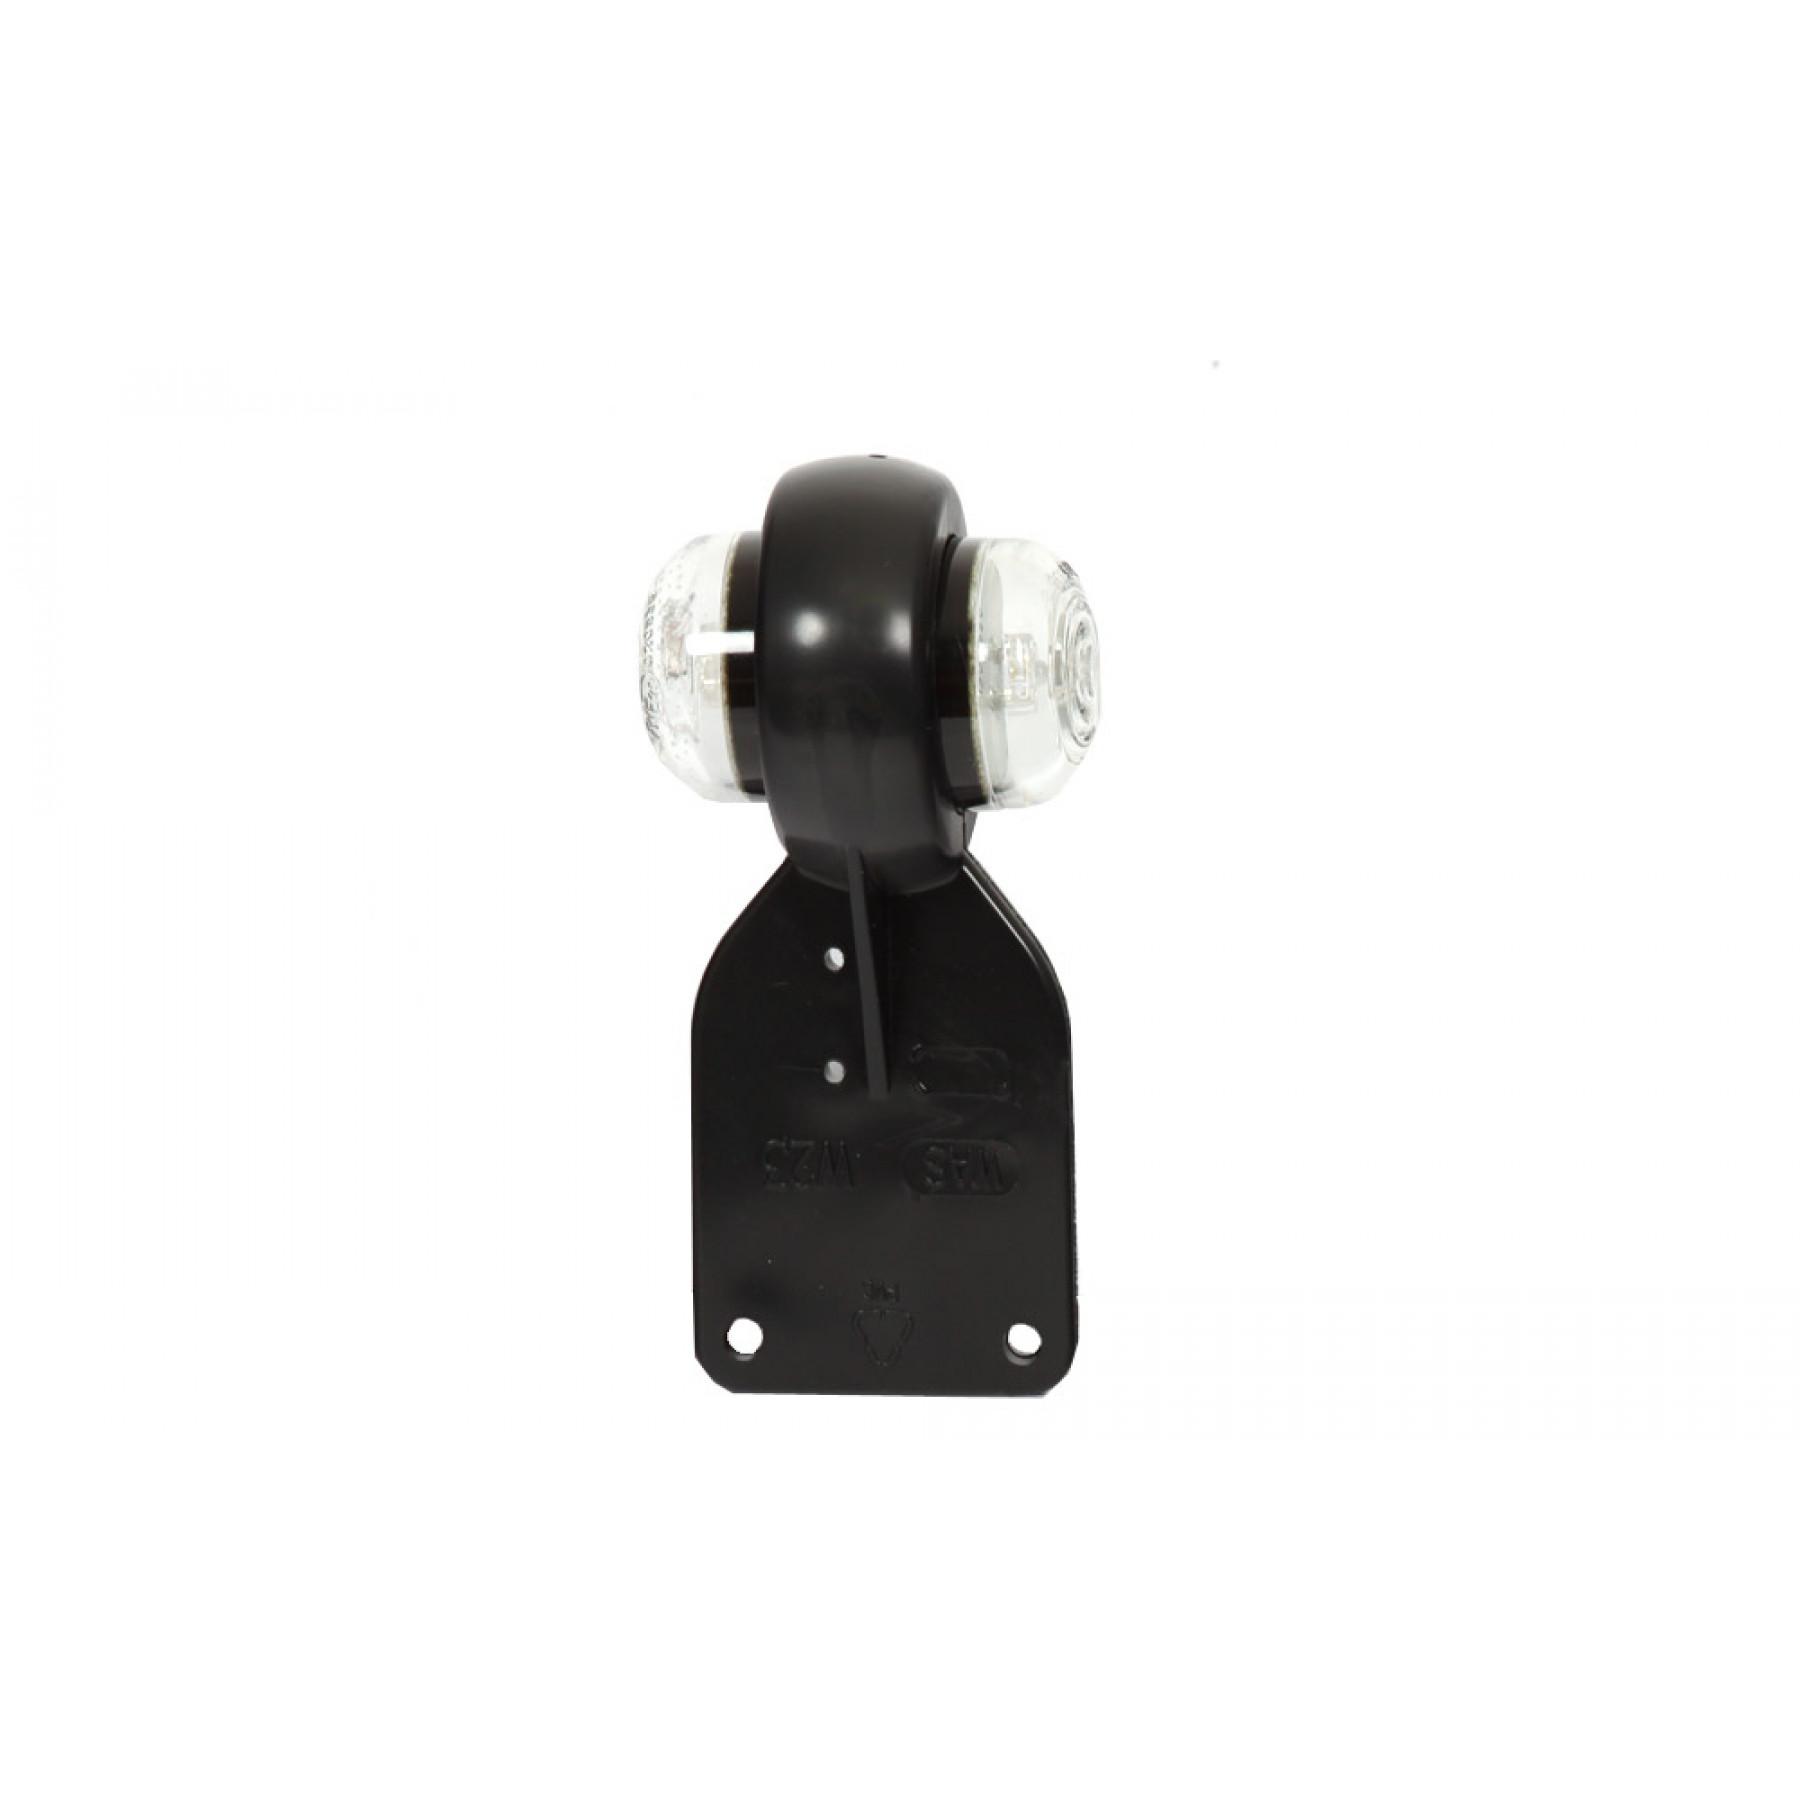 Markerings-breedtelamp 12/24v LED rond met steun